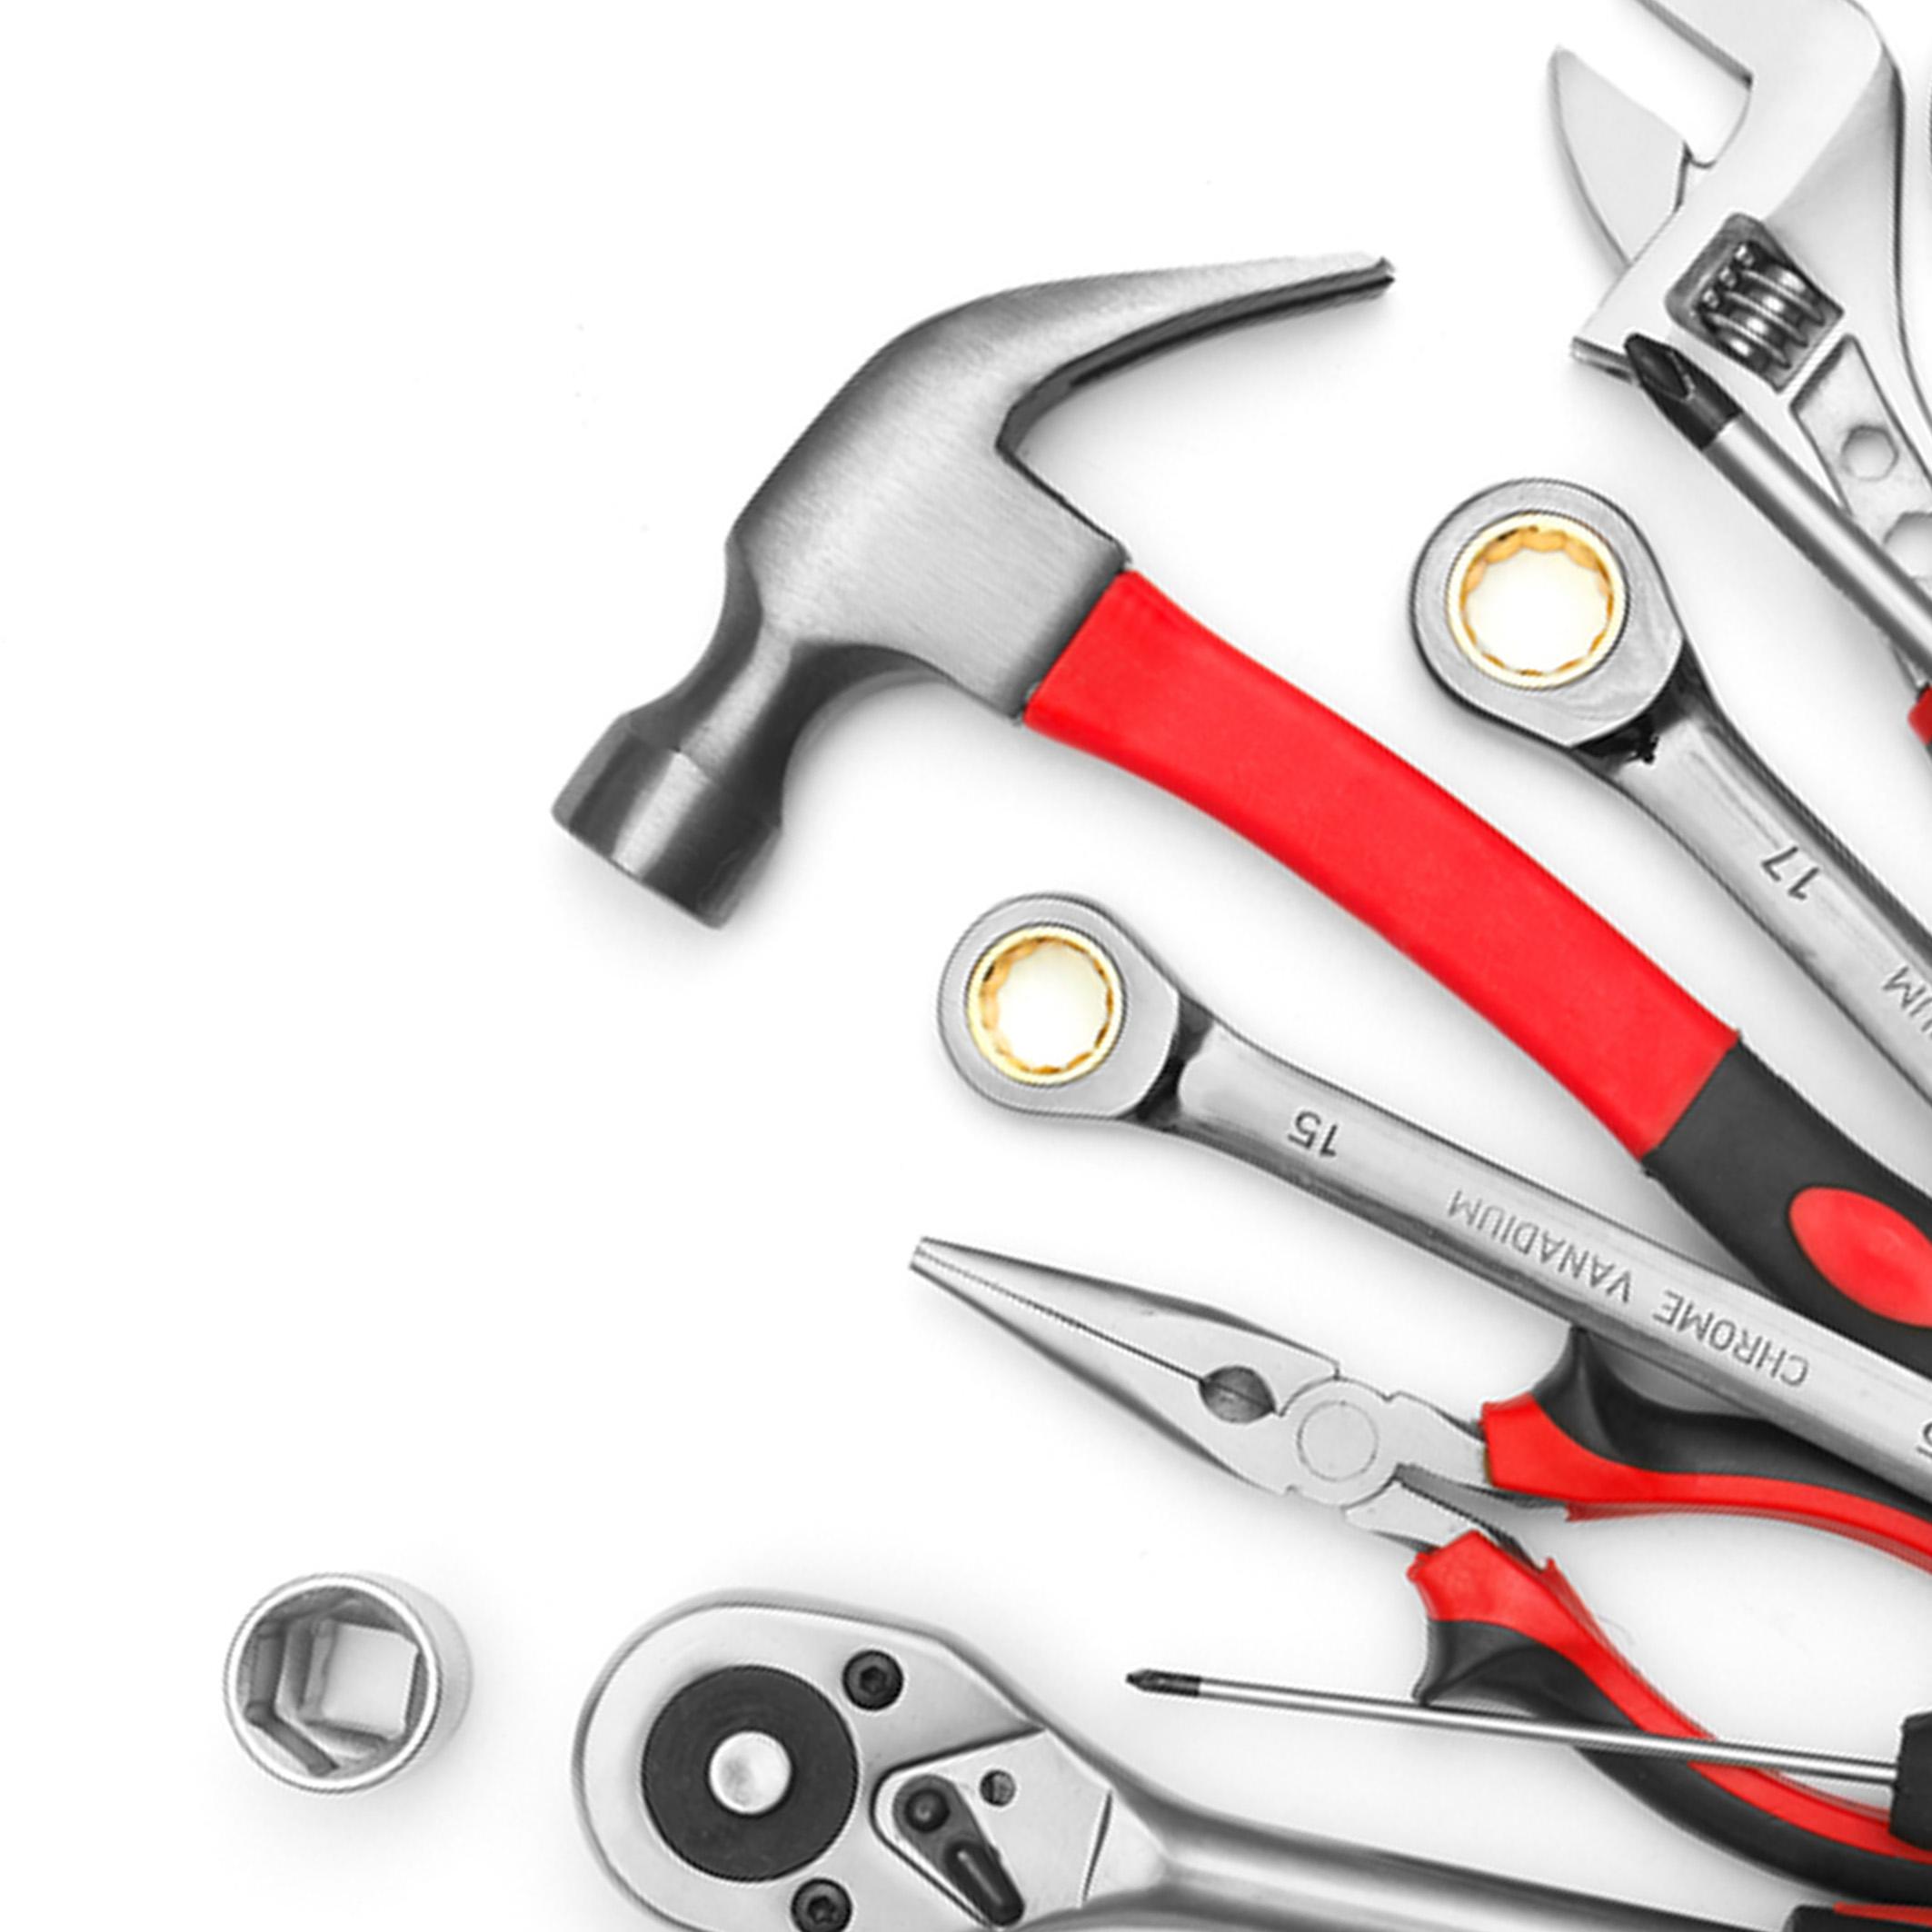 Jenis Jenis Kunci yang Sering digunakan Pada Bengkel Otomotif dan Cara Perawatannya